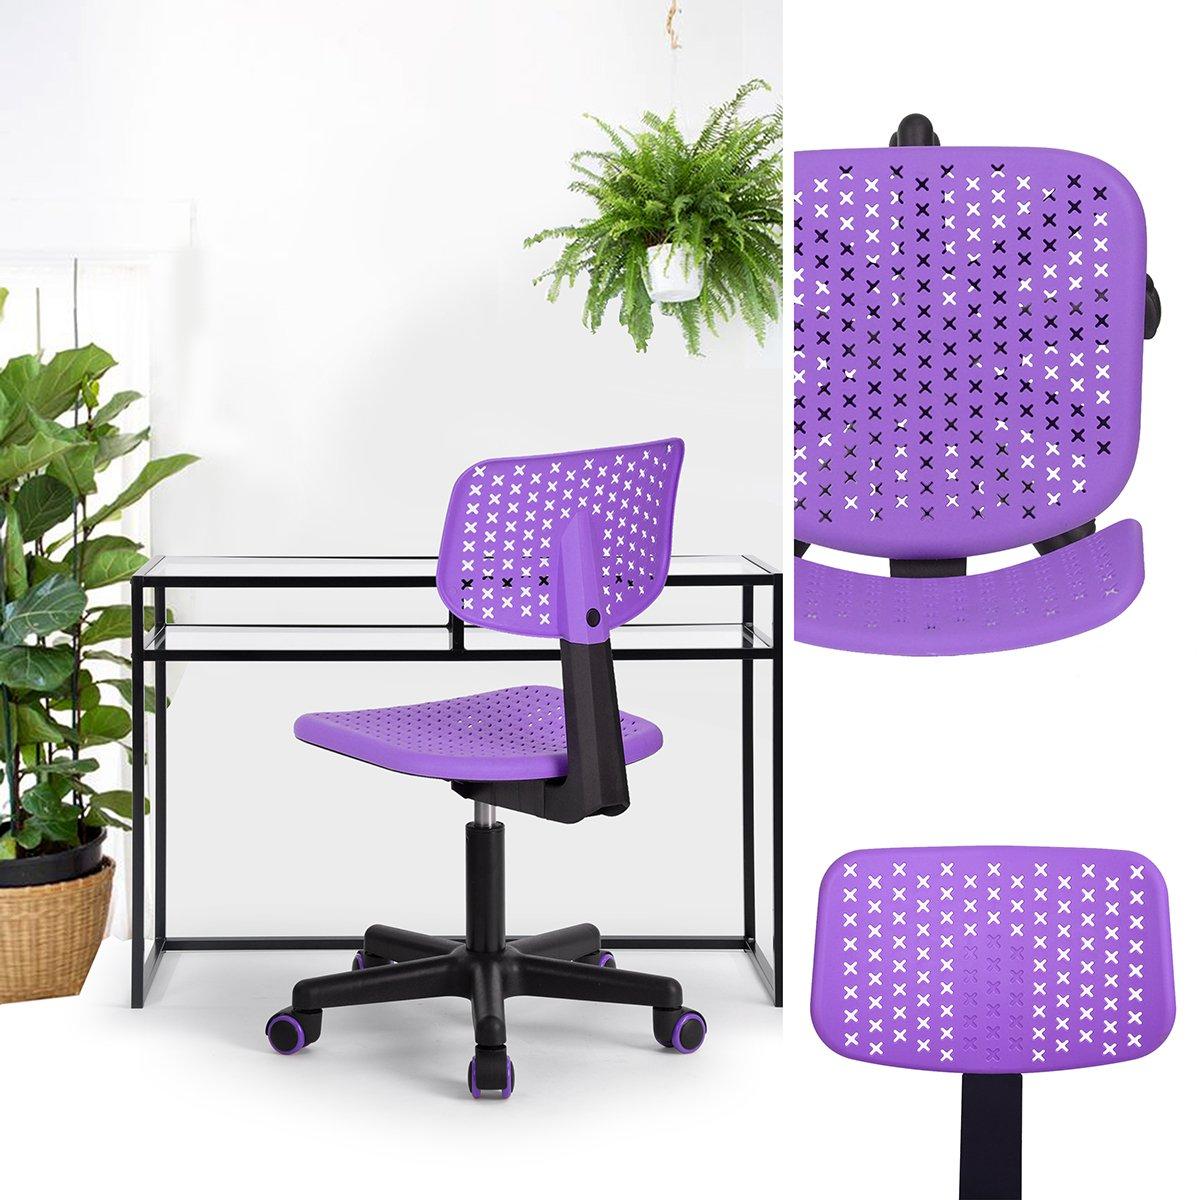 FurnitureR Kids Low-Back Adjustable Computer Seat Office Desk Task Swivel Armless Children Study Chair, Purple